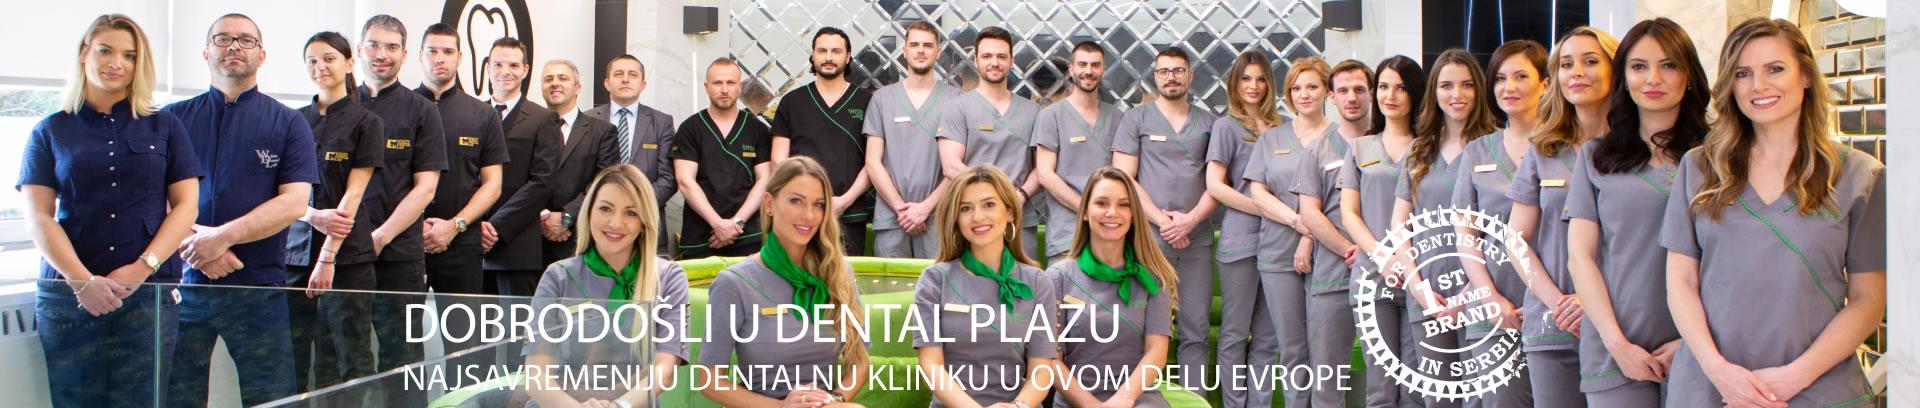 dental plaza slika tima